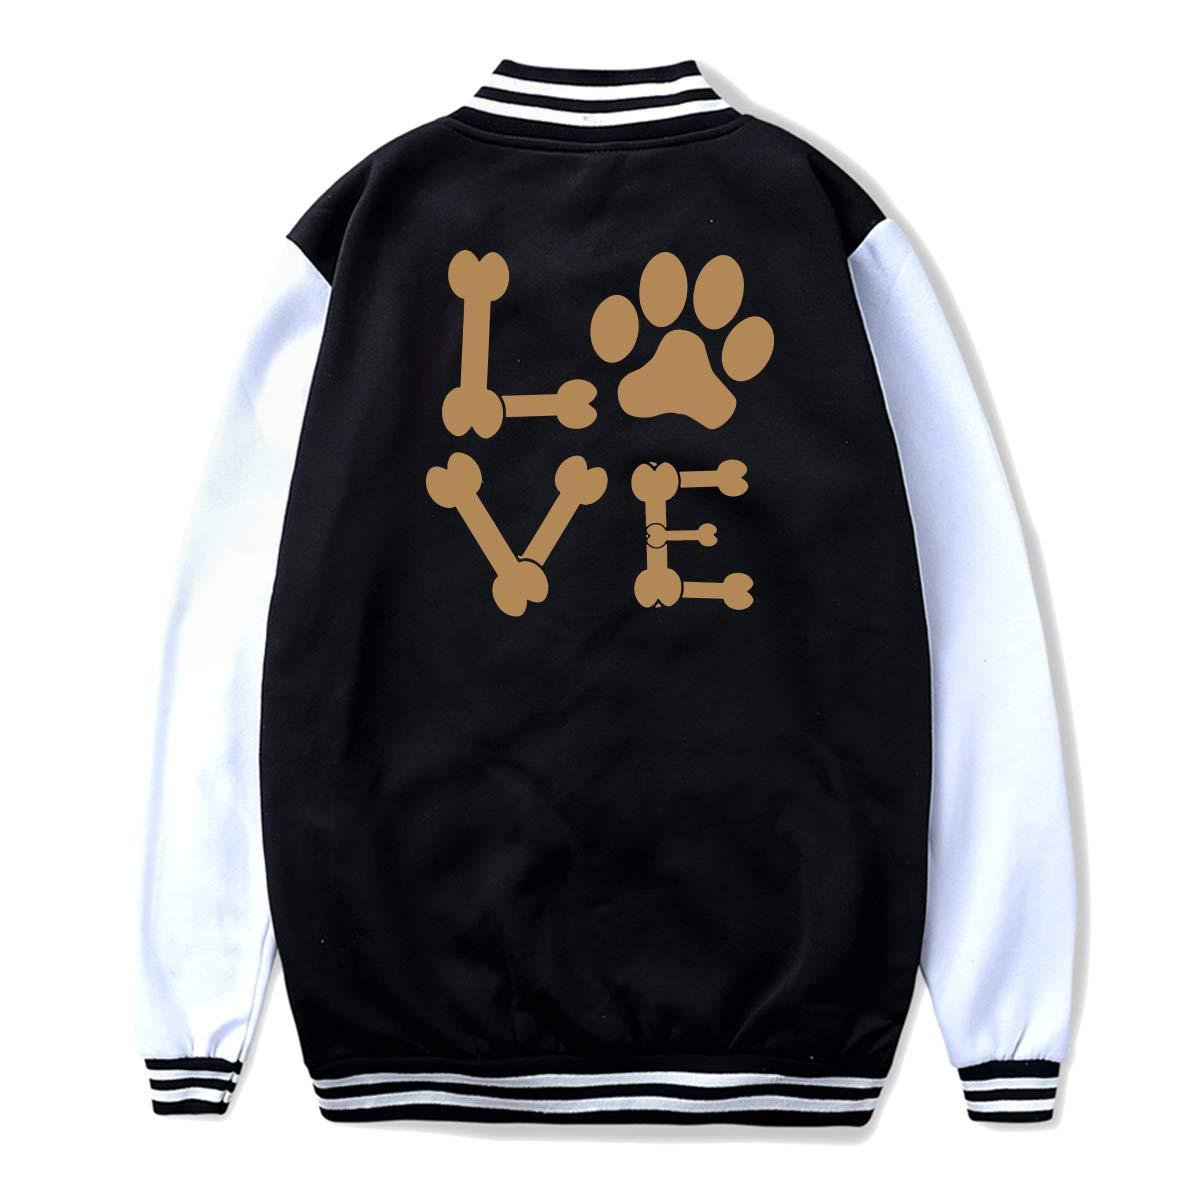 Back Print Unisex Youth Baseball Uniform Jacket Pawprint Dog Bones Animal Lover Sweater Sport Coat